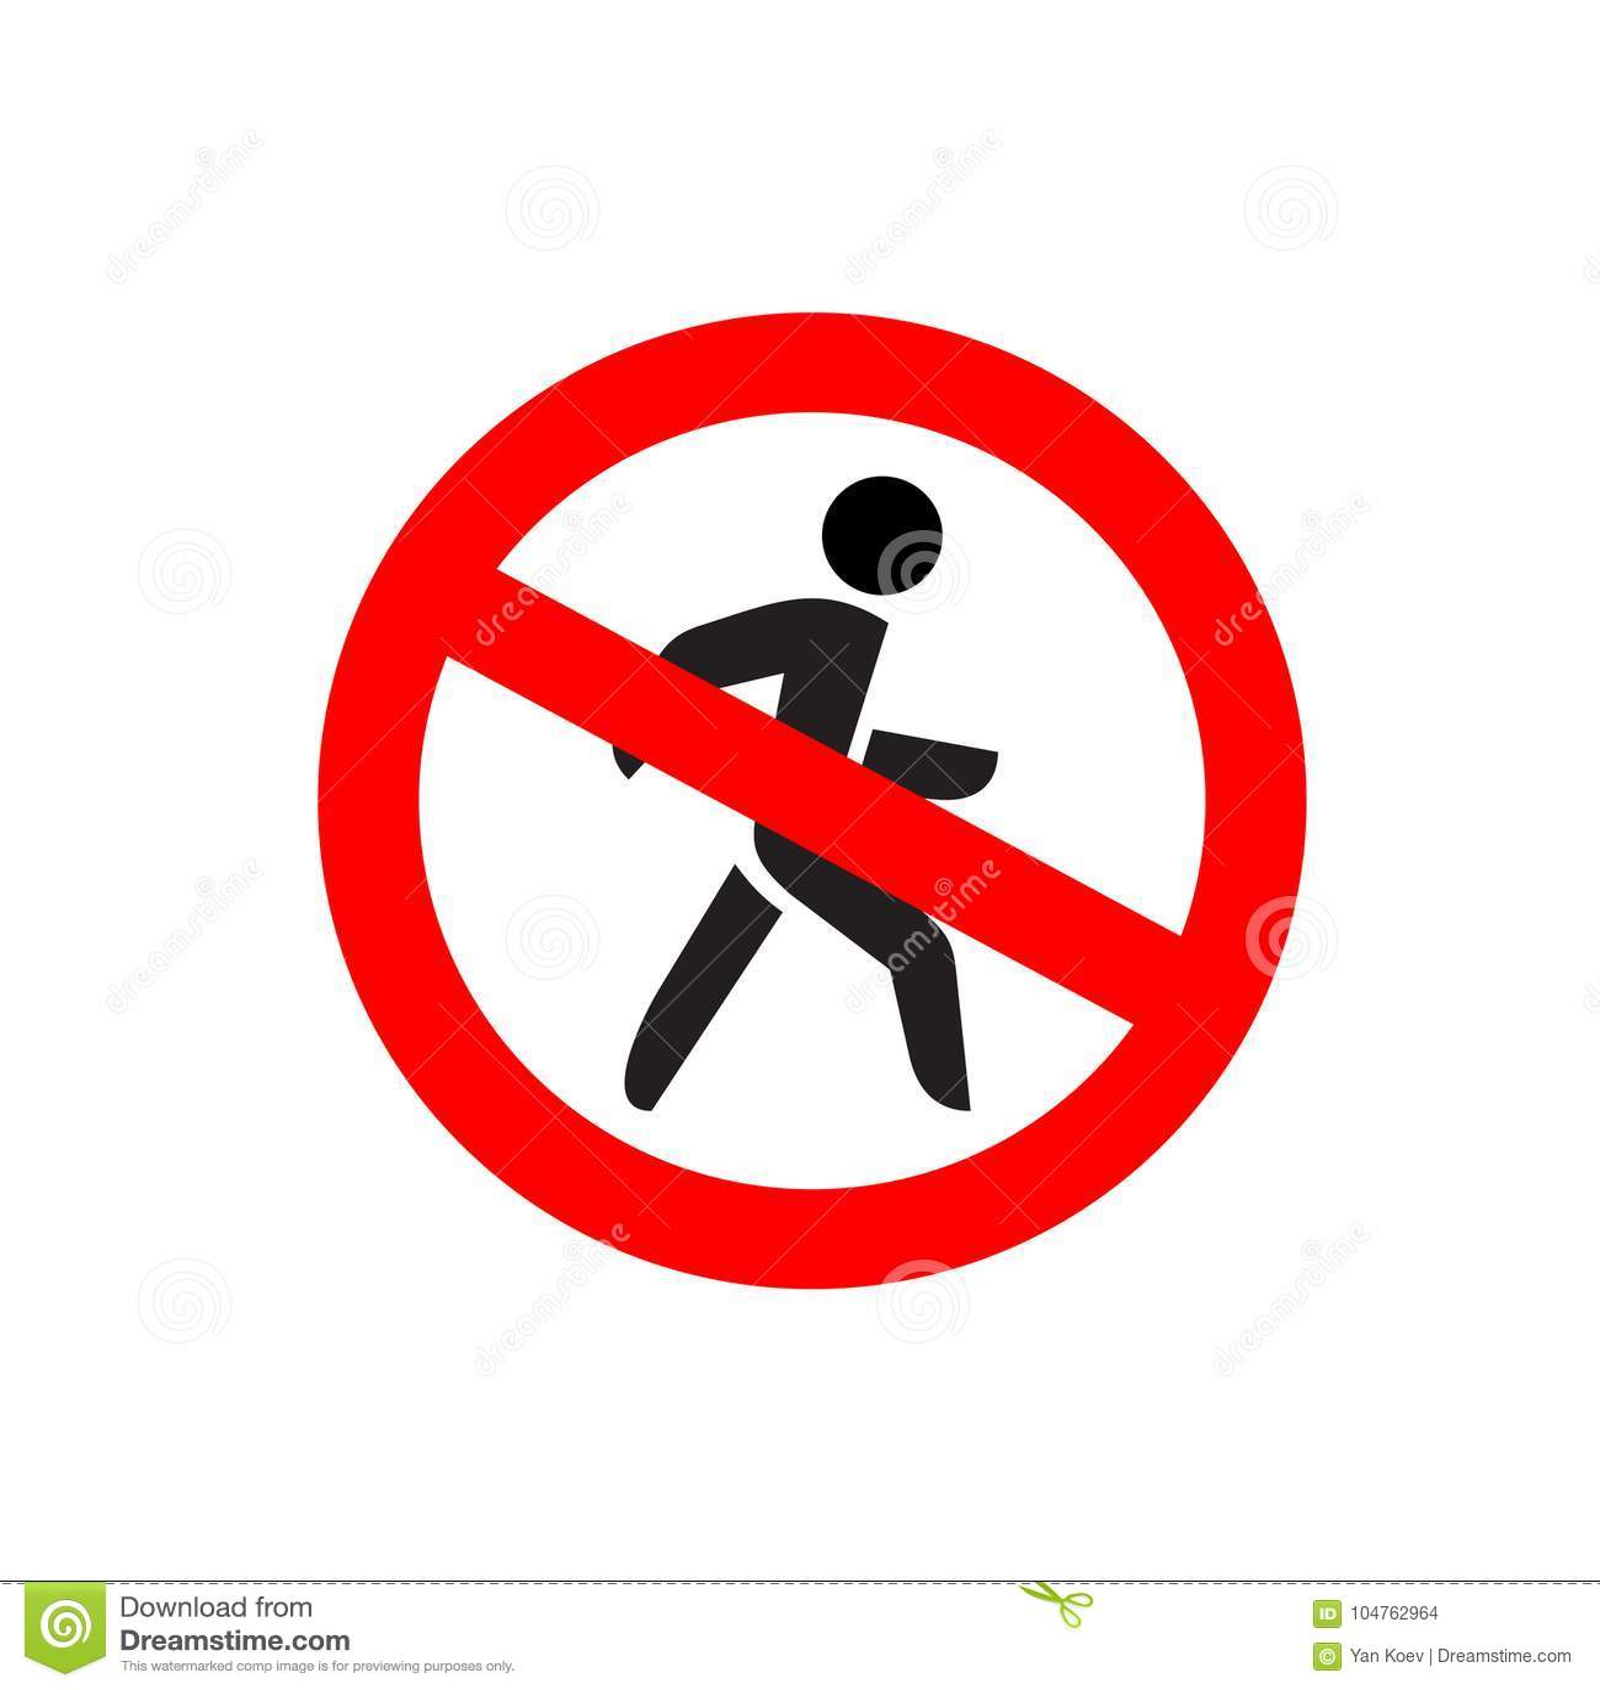 No entry symbol. Stop no walking pedestrian warning sign.